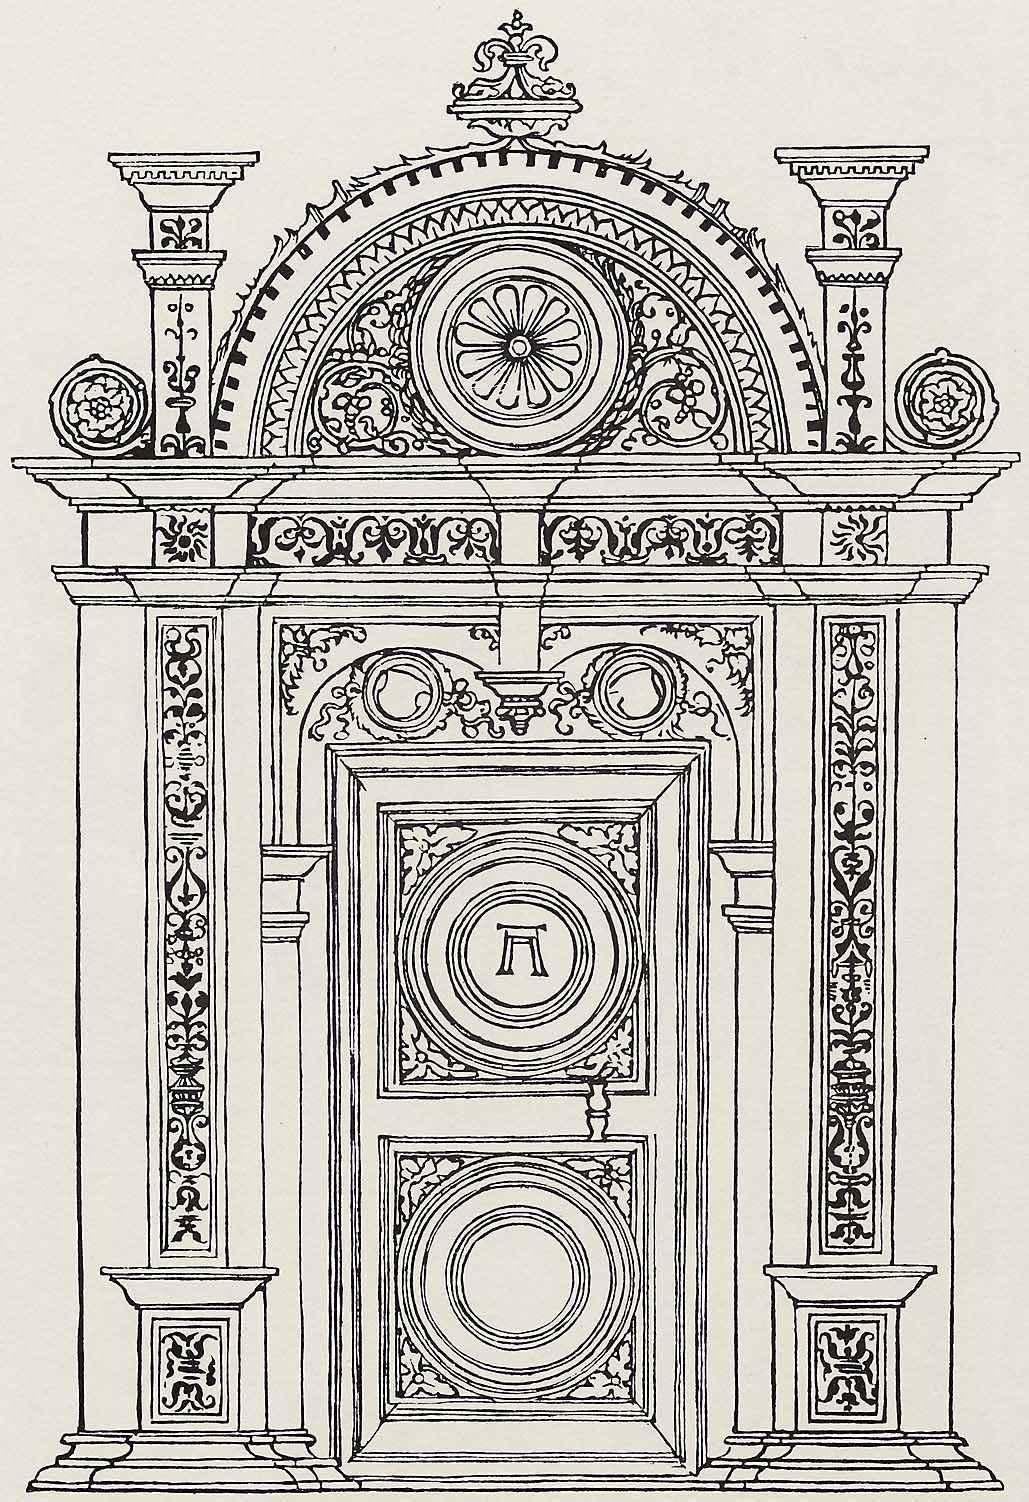 Designof a portaltechnology, 1525-1530